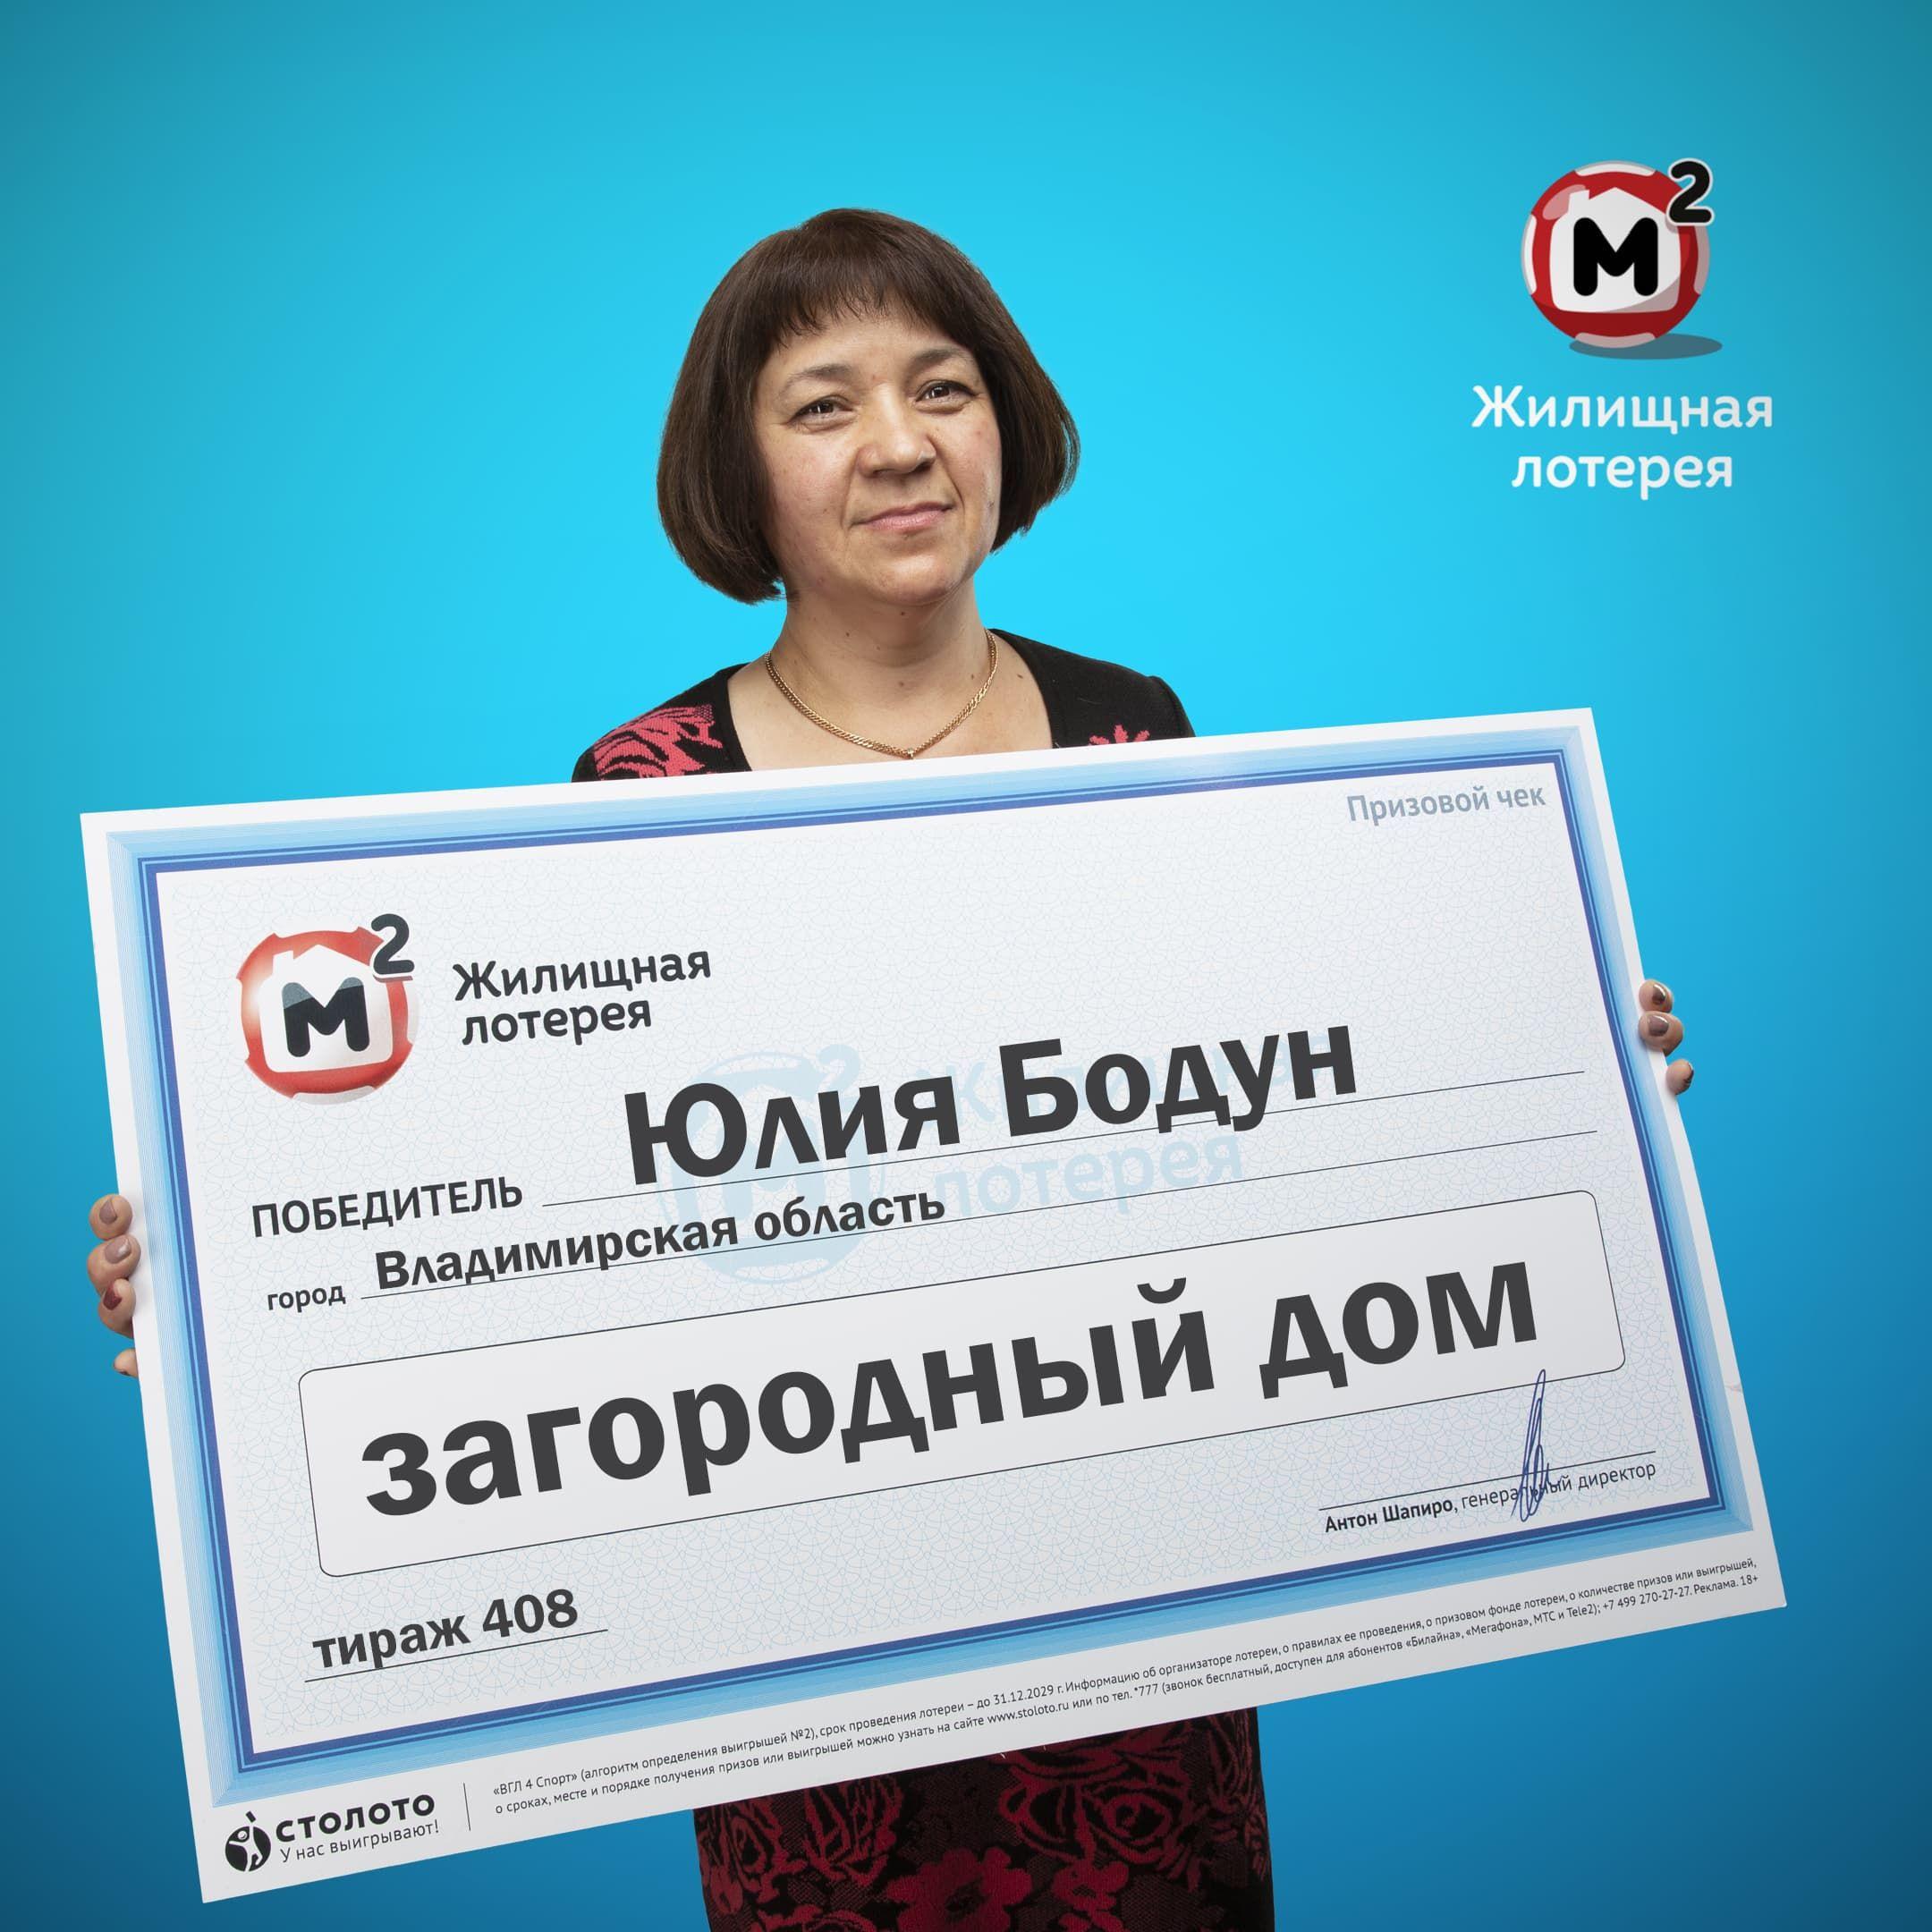 Победительница лотереи у своего дома